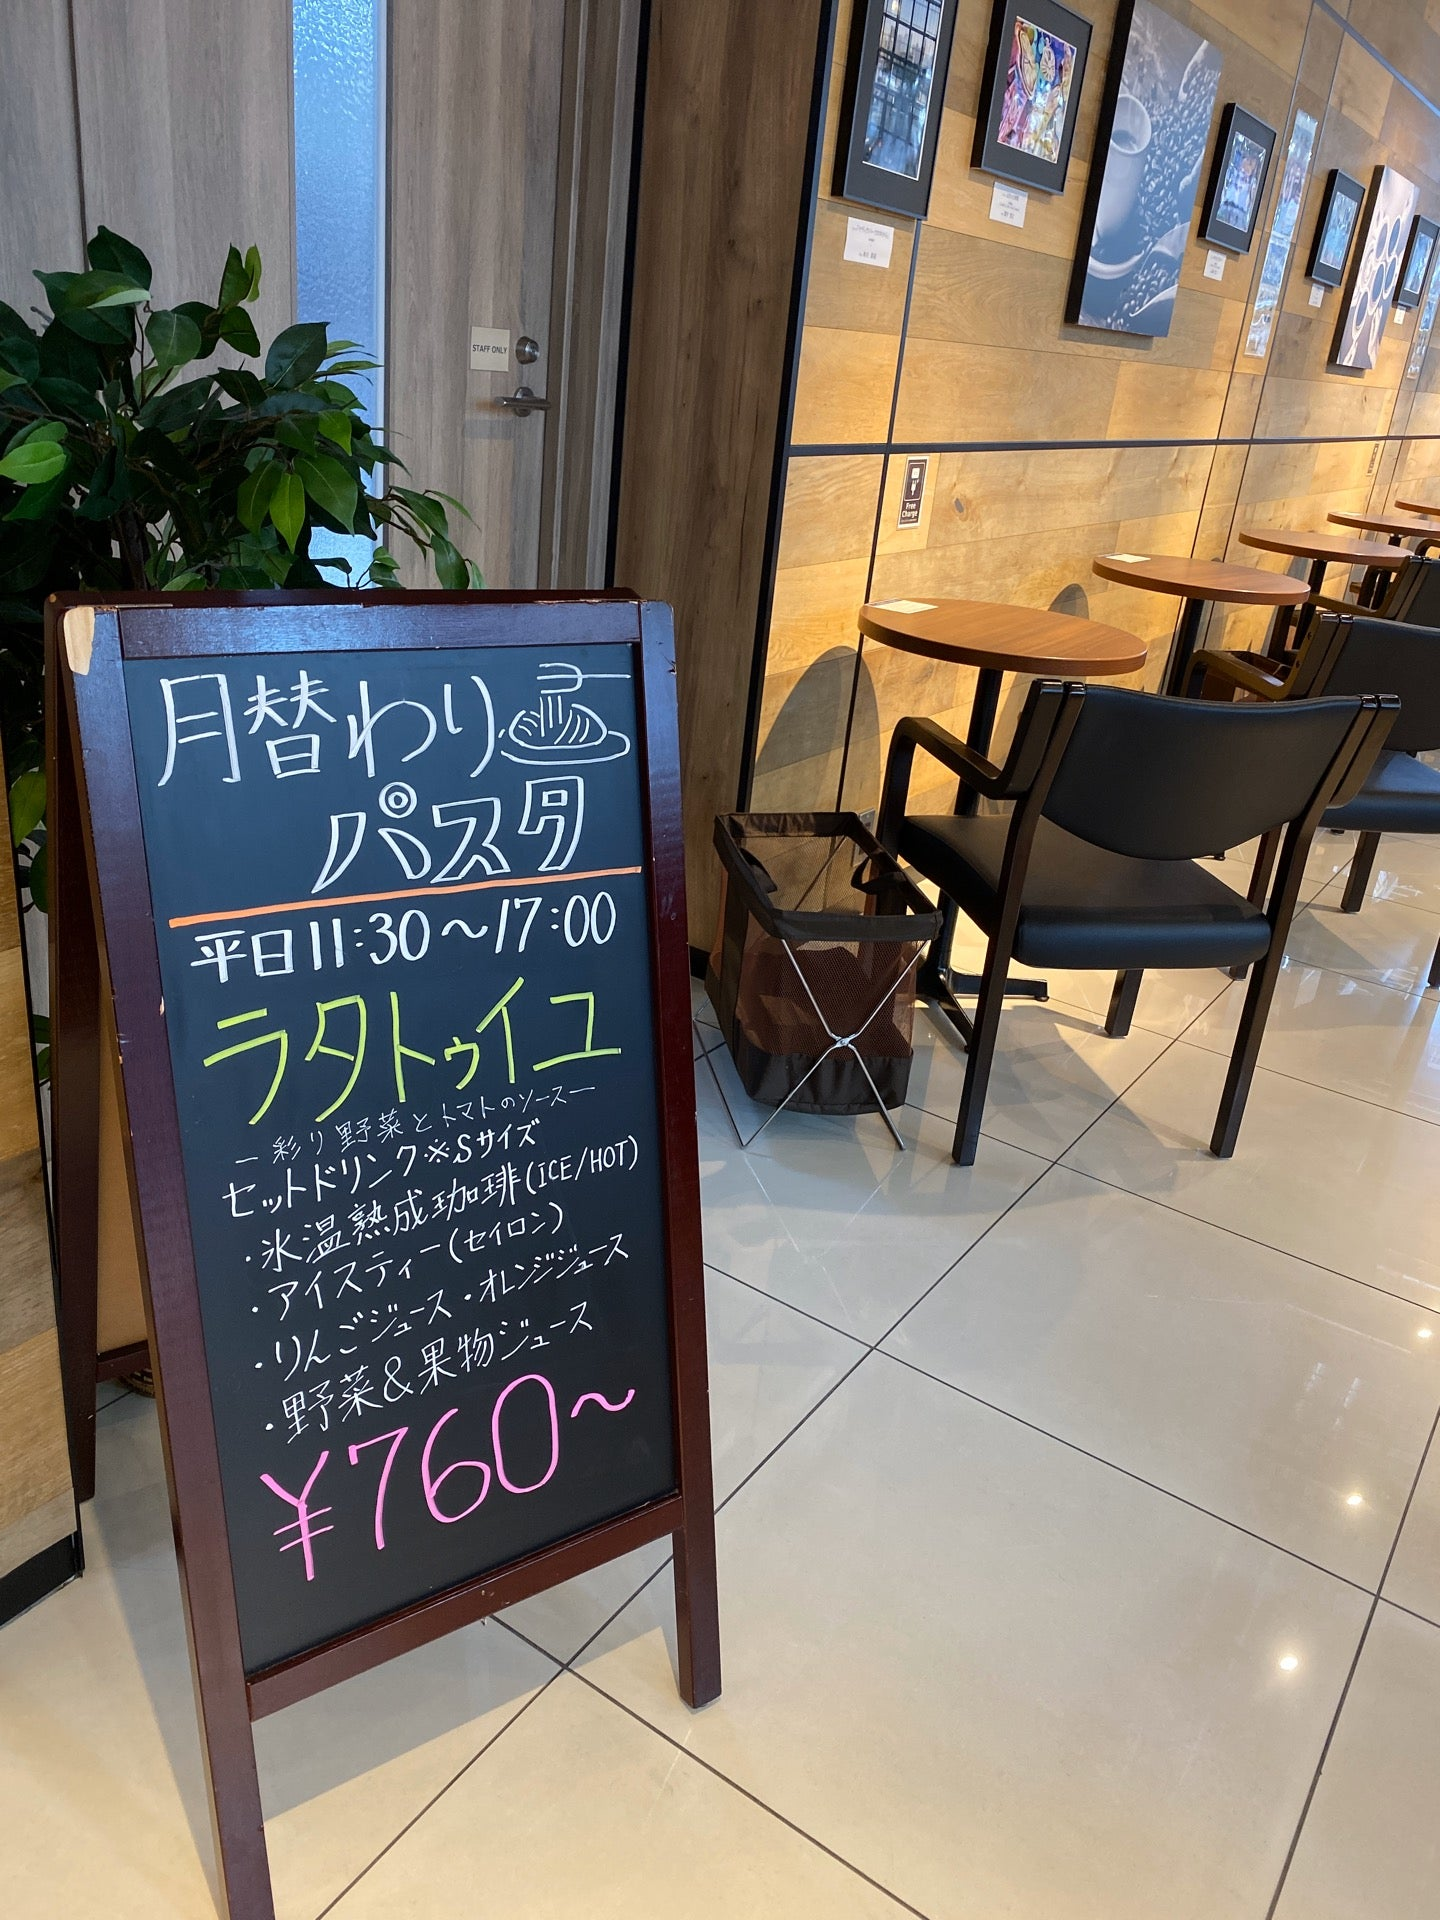 I'm at キーズカフェ ビックカメラ名古屋JRゲートタワー店 - @bic_keyscafe in 名古屋市, 愛知県 https://t.co/zfGK7DIMrs https://t.co/DFglNkwYHI